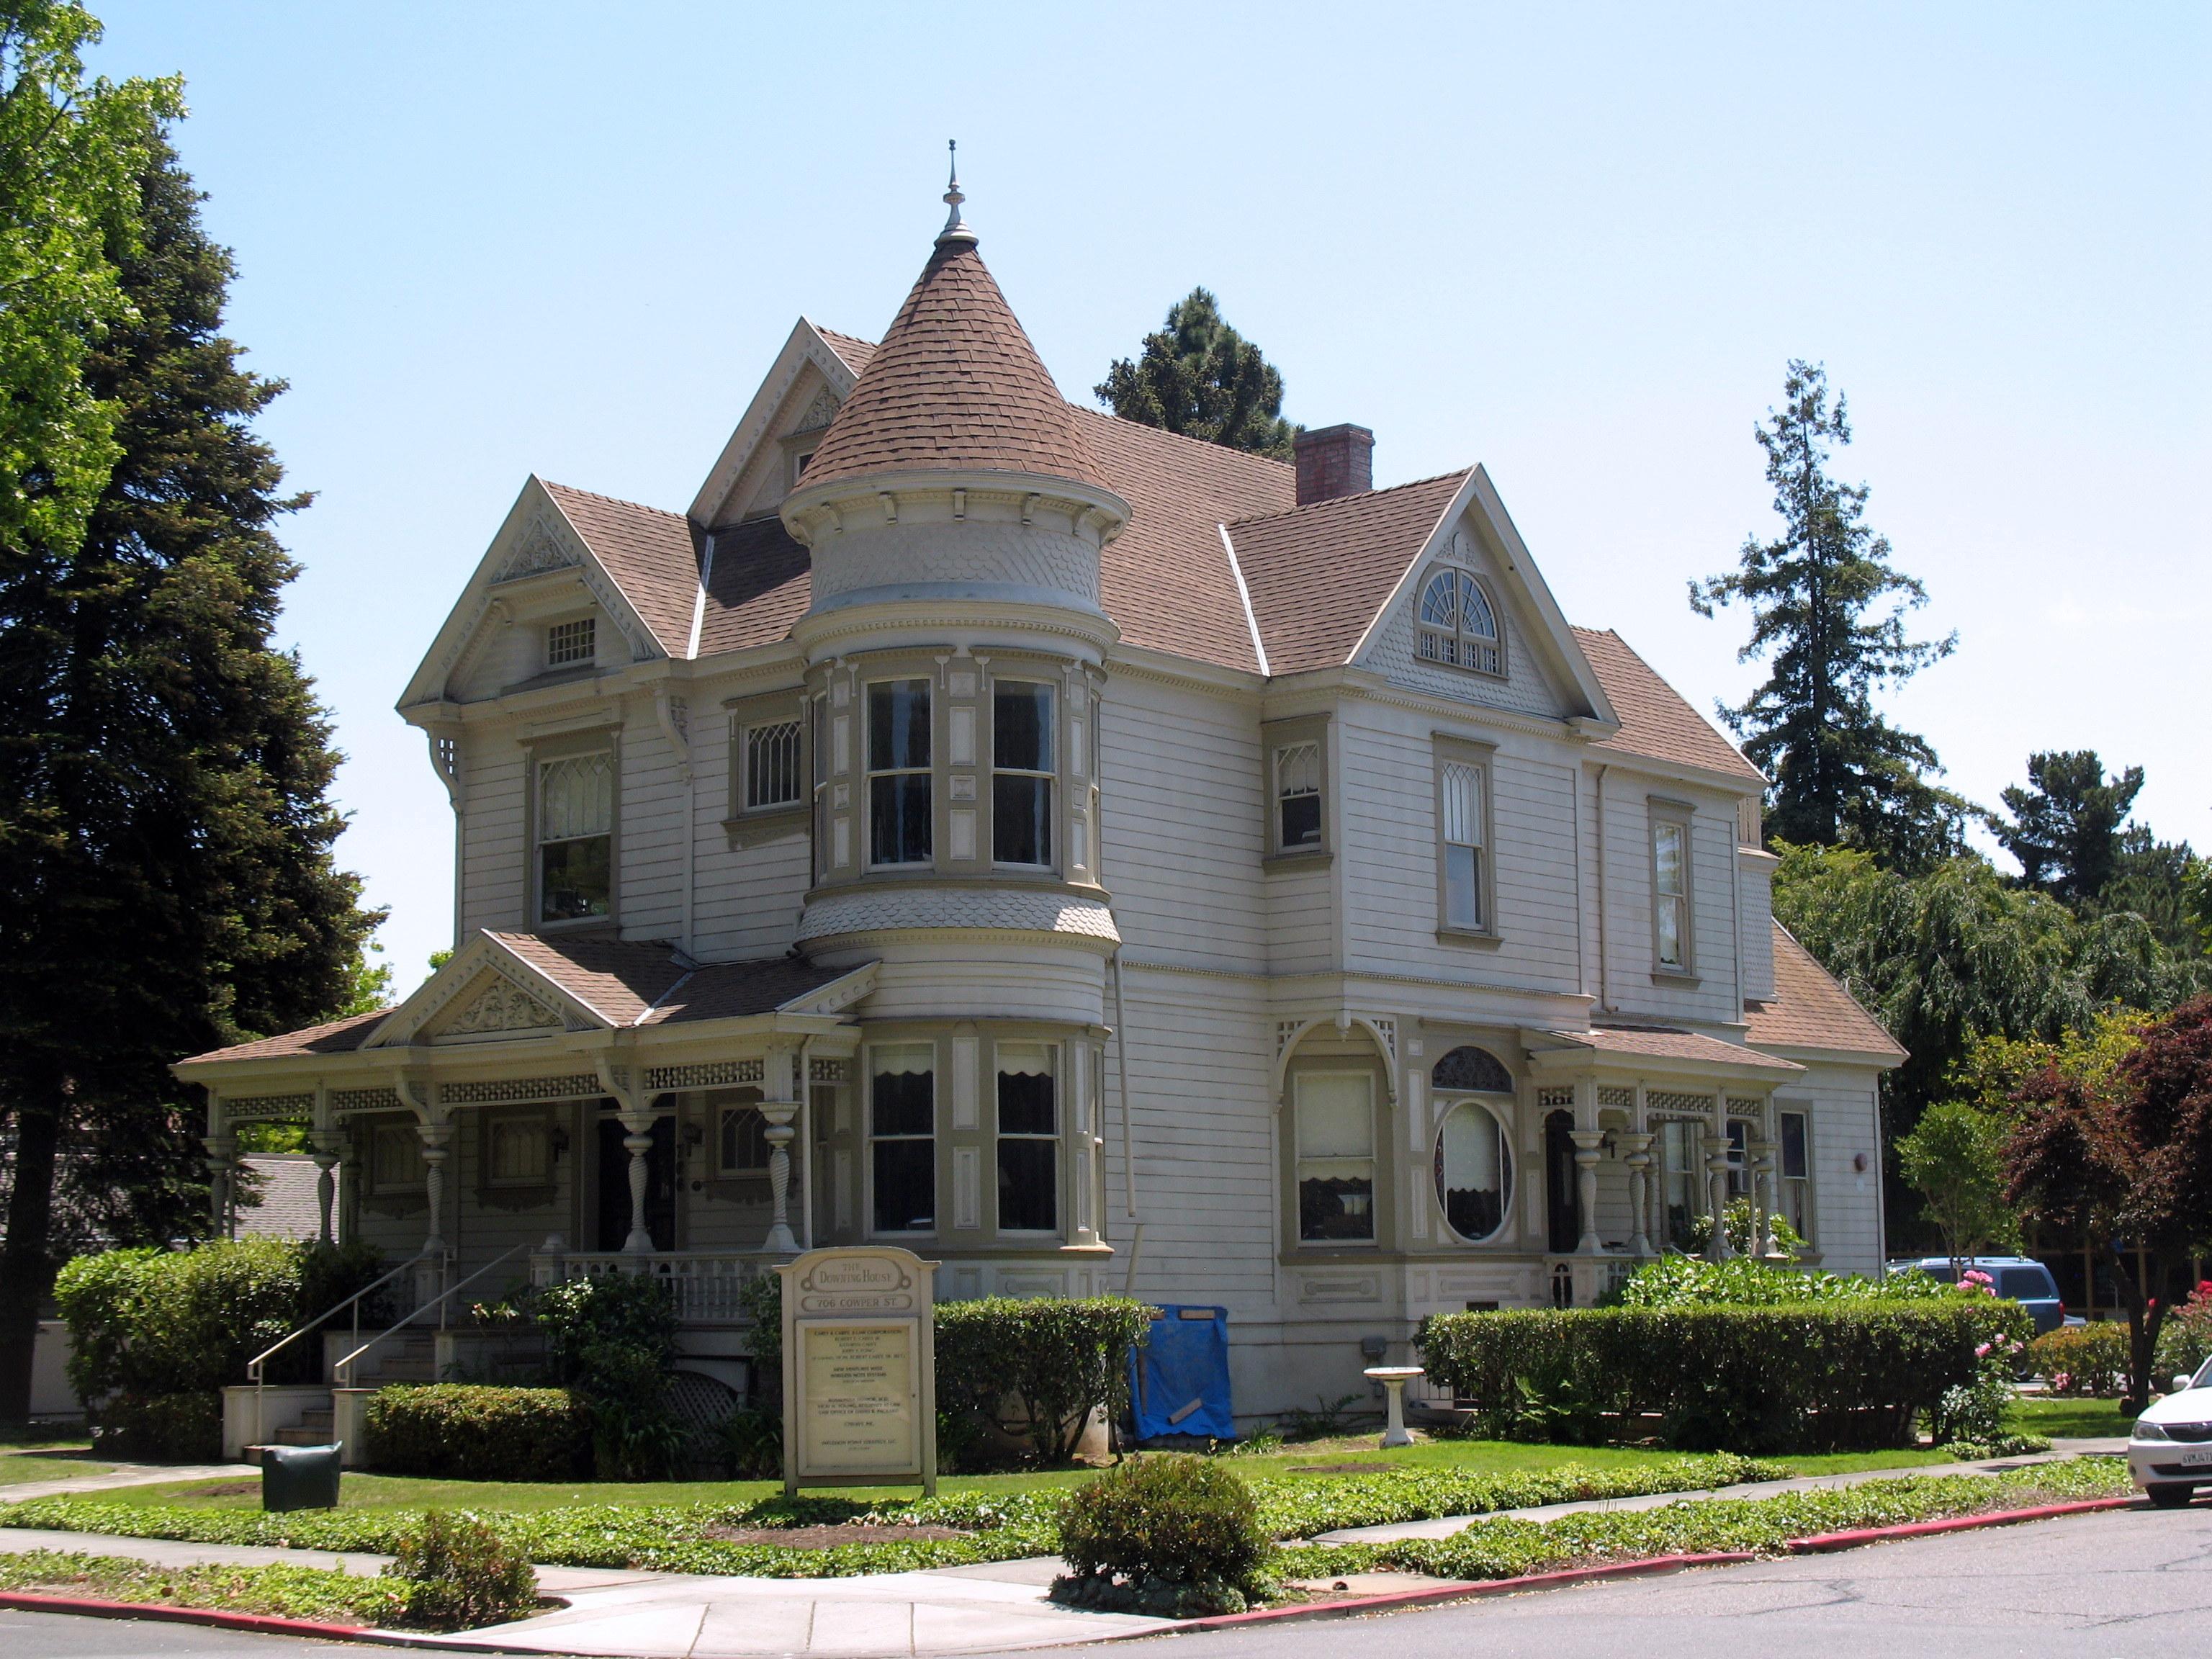 Building A House In Palo Alto